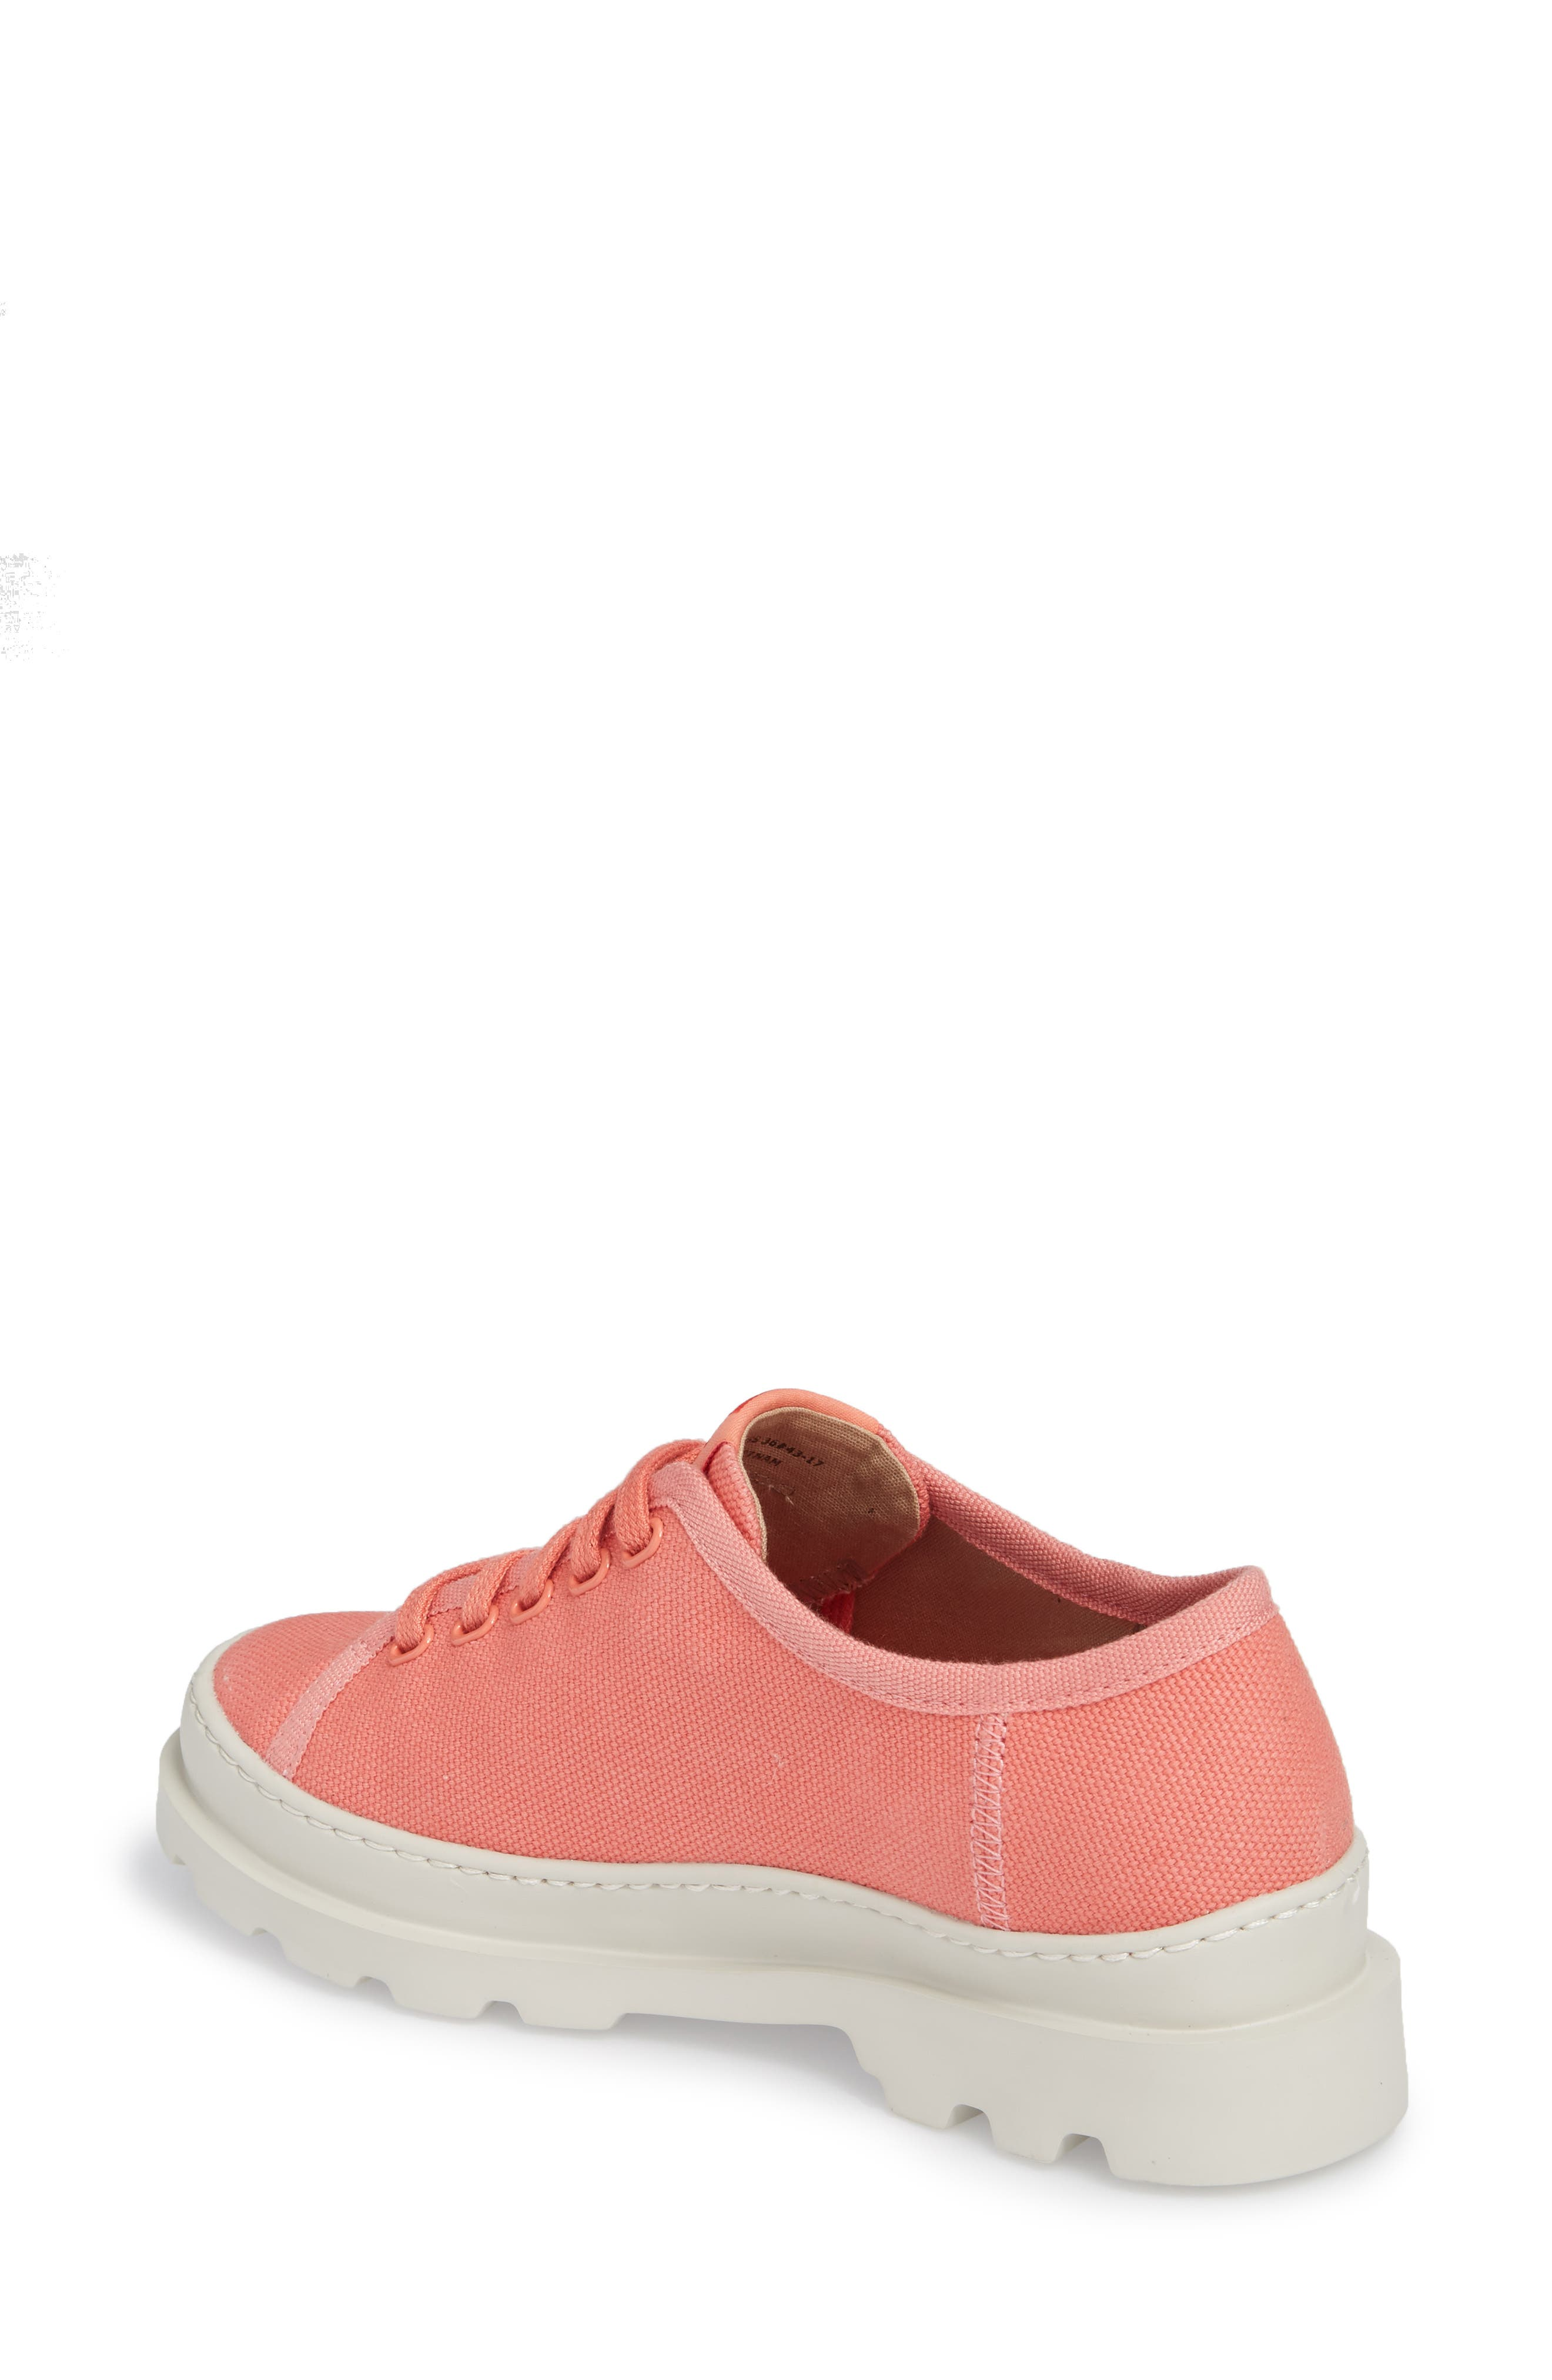 Brutus Lugged Platform Sneaker,                             Alternate thumbnail 2, color,                             PINK